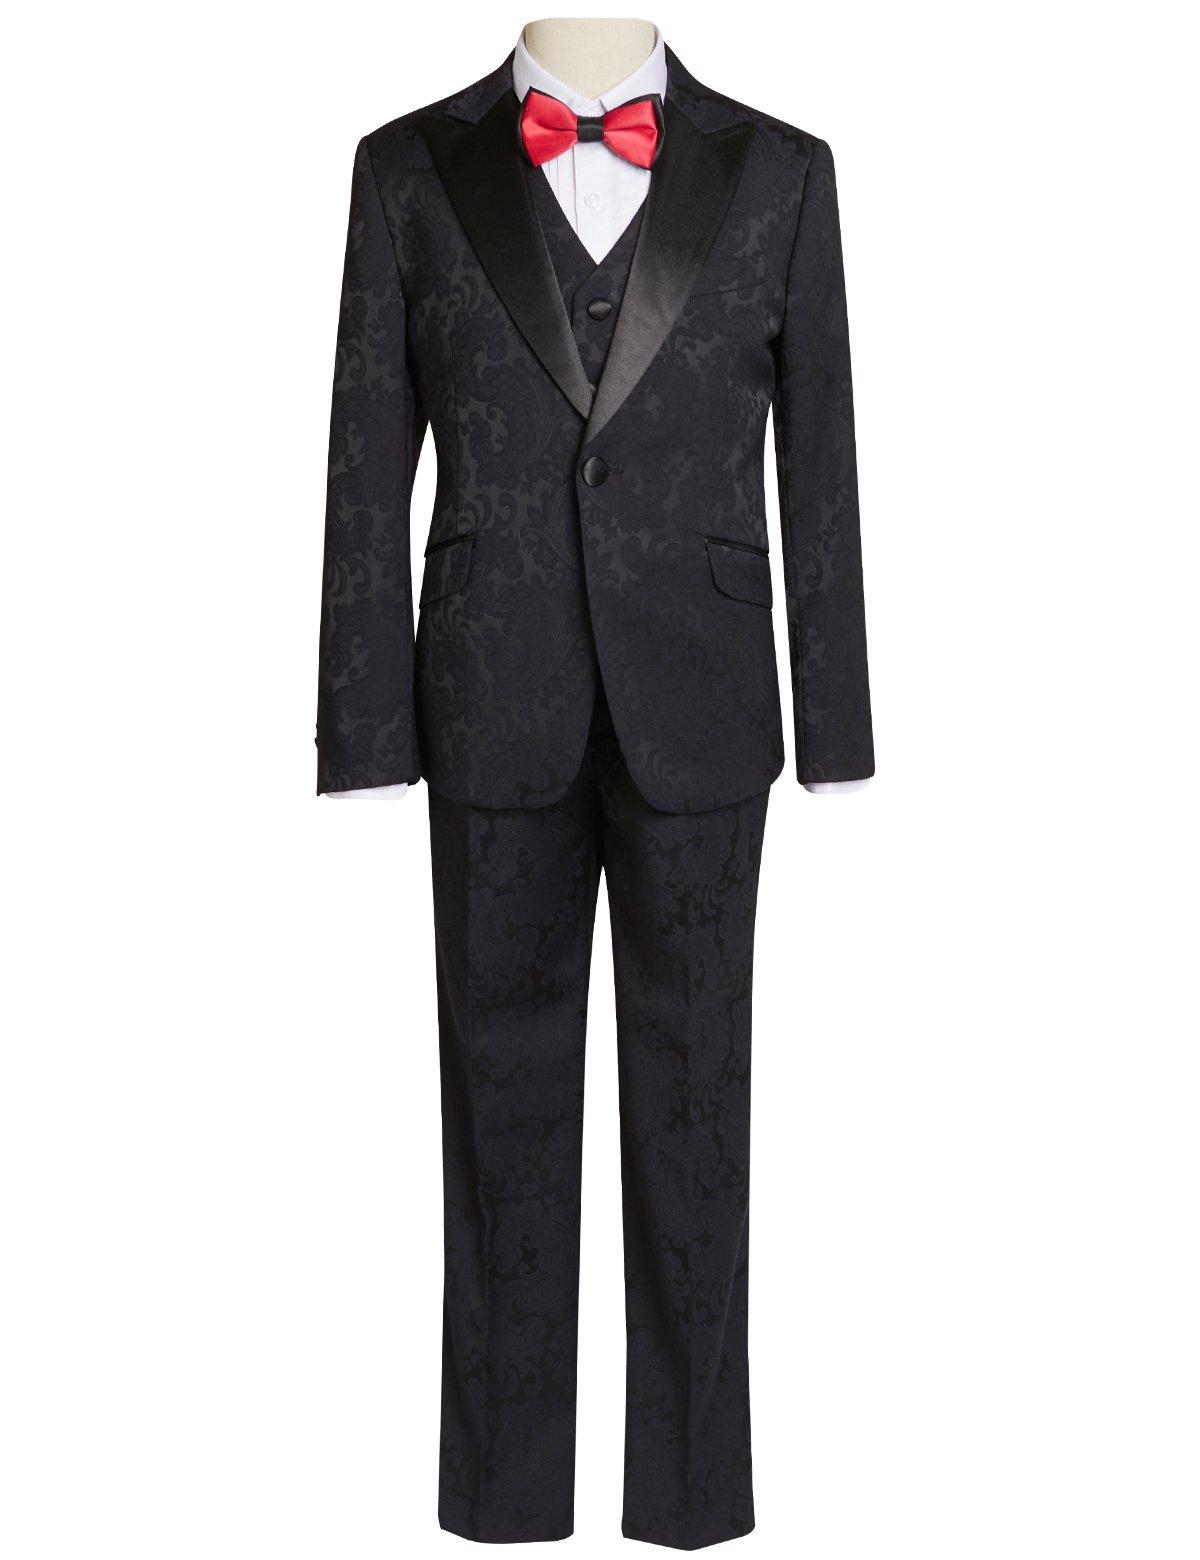 ELPA ELPA Boy Suits 5 Sets Wedding Host Graduation Black Print Boys Slim Fit Suit